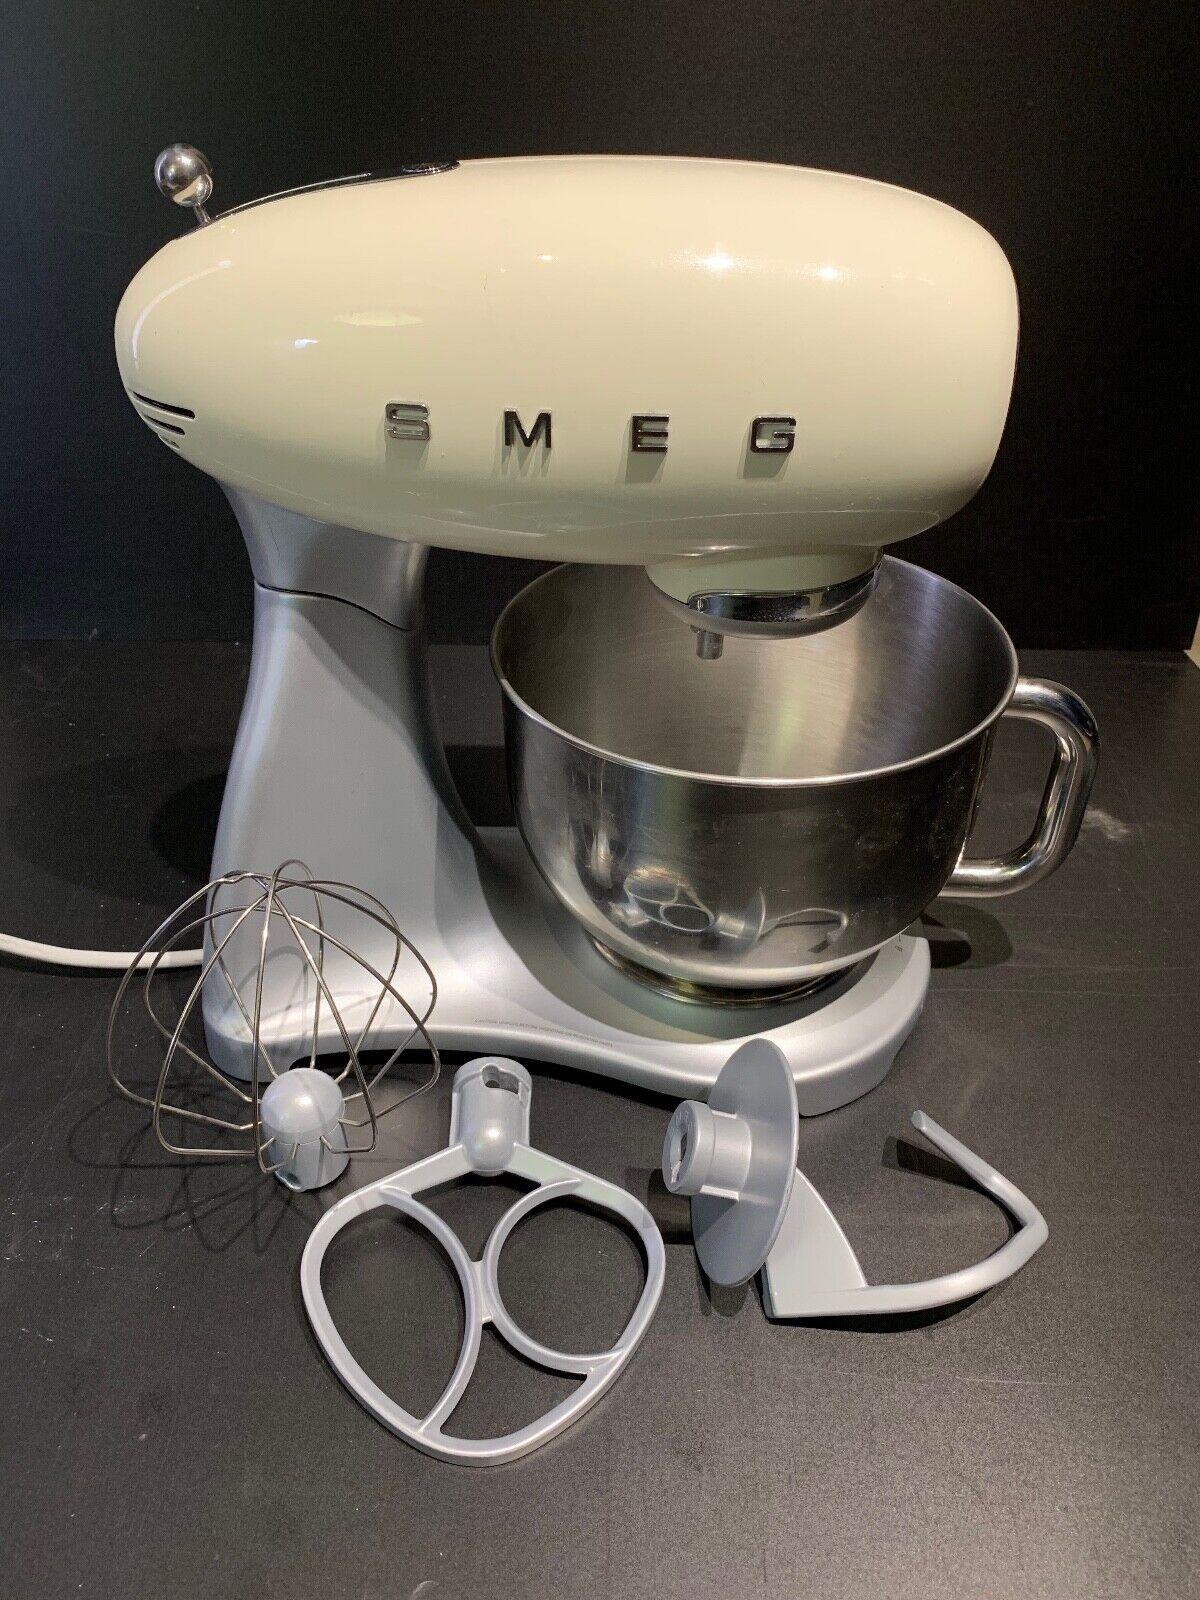 SMEG Cream 50's Retro Style 5-Quart Stand Mixer Stainless Steel Bowl SMF01CRUS